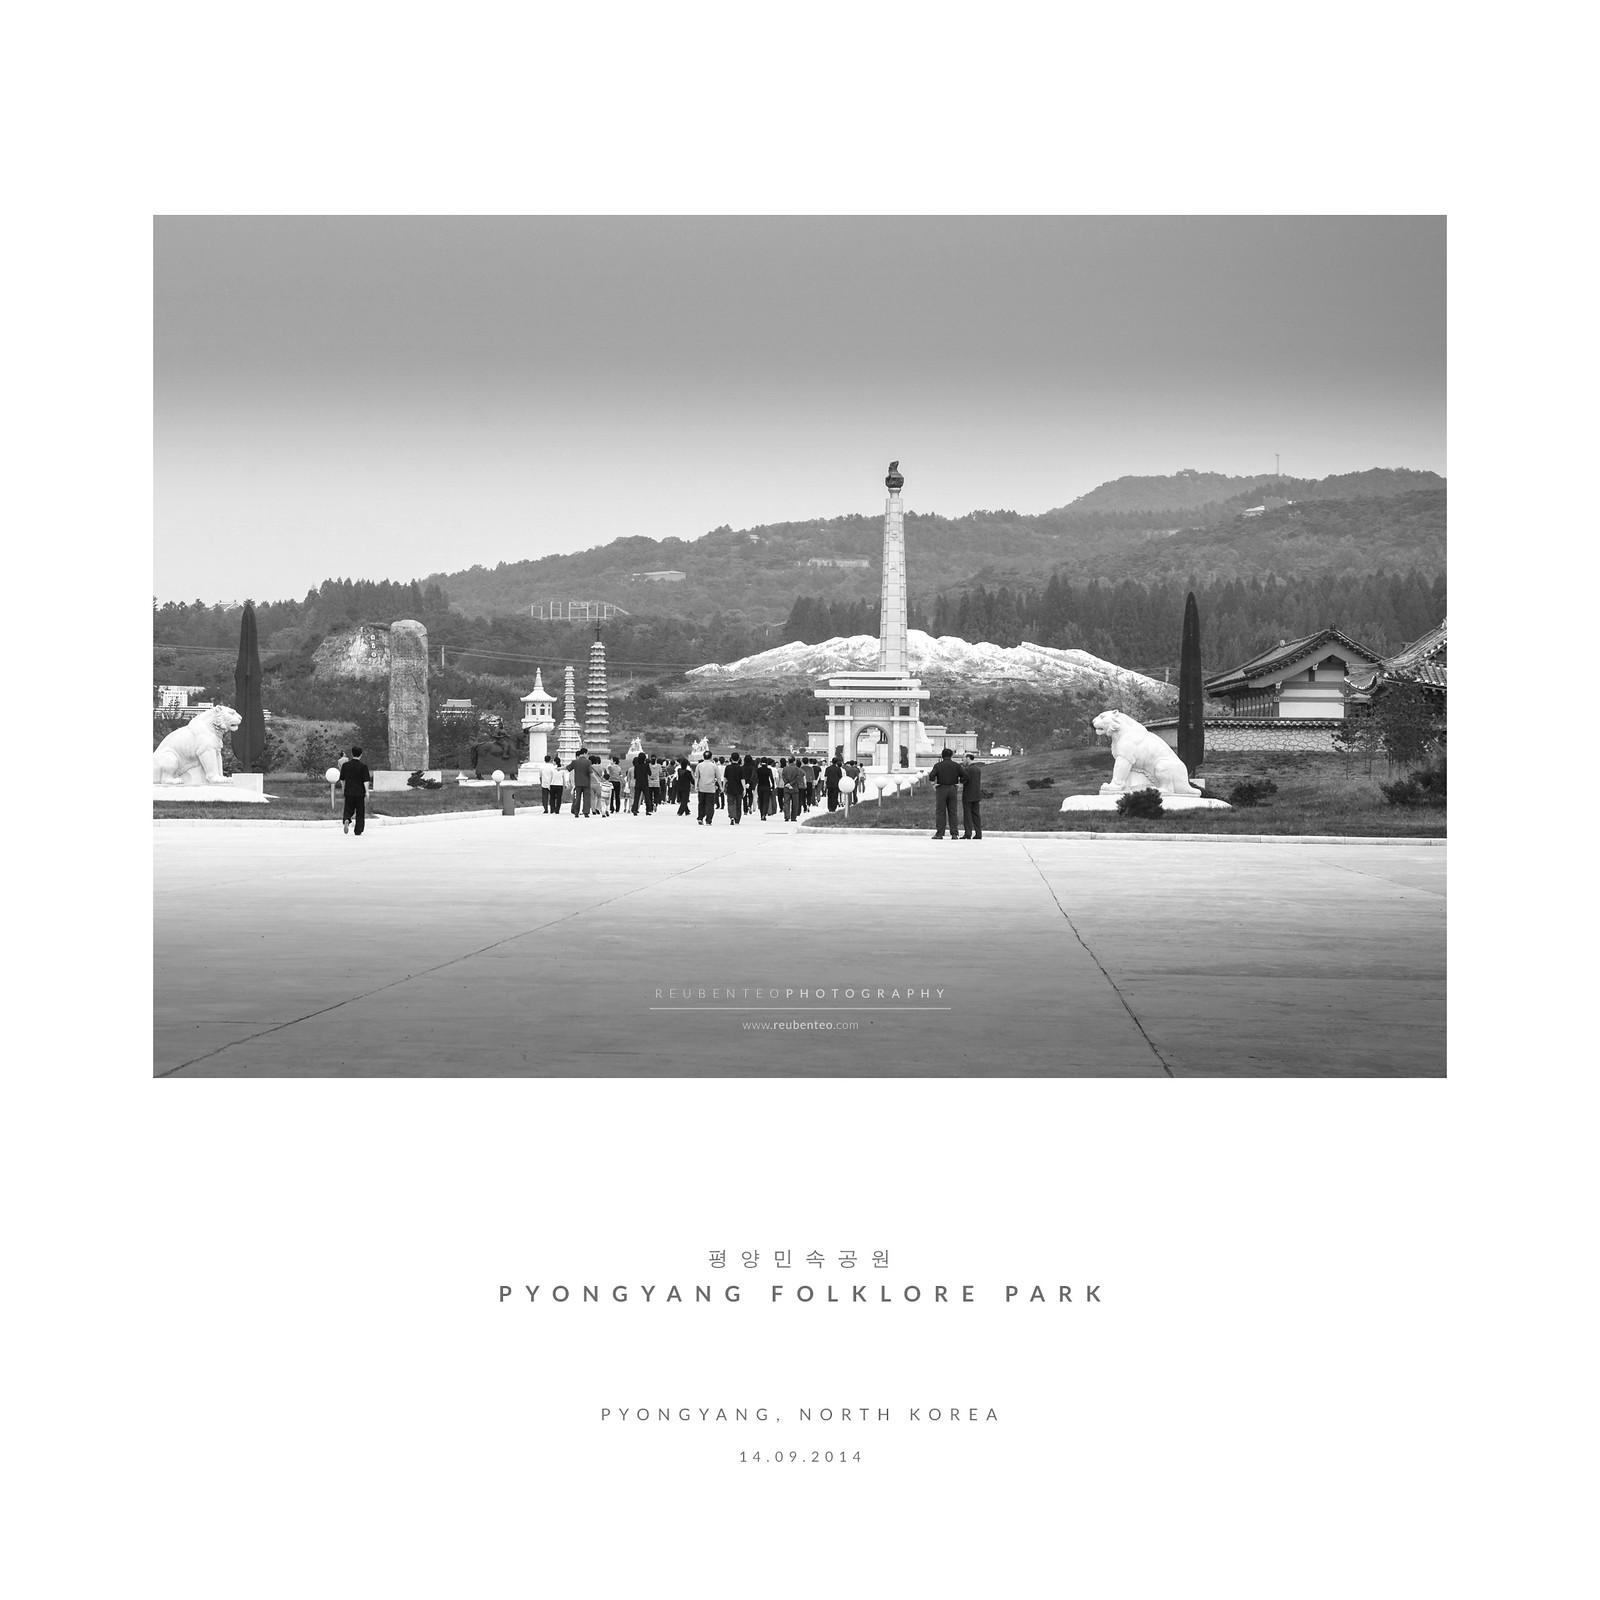 Pyongyang Folklore Park